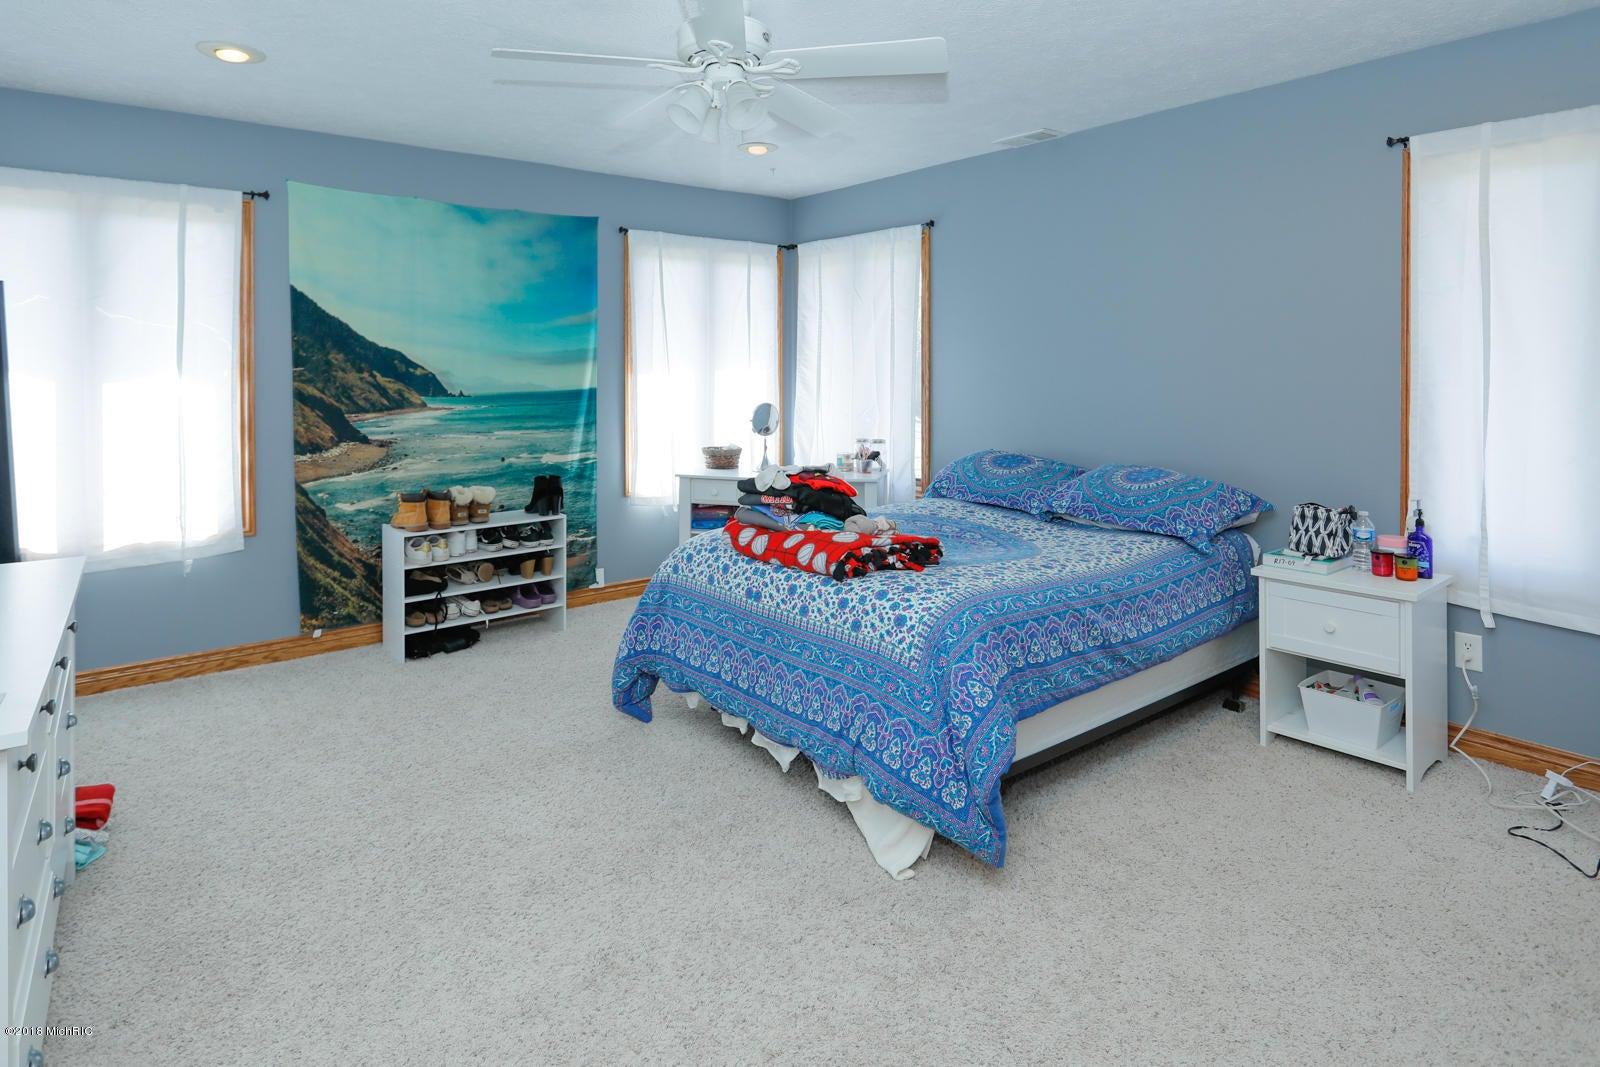 8704 E Long Lake Drive, Scotts, MI, 49088, MLS # 18010213 | Jaqua ...